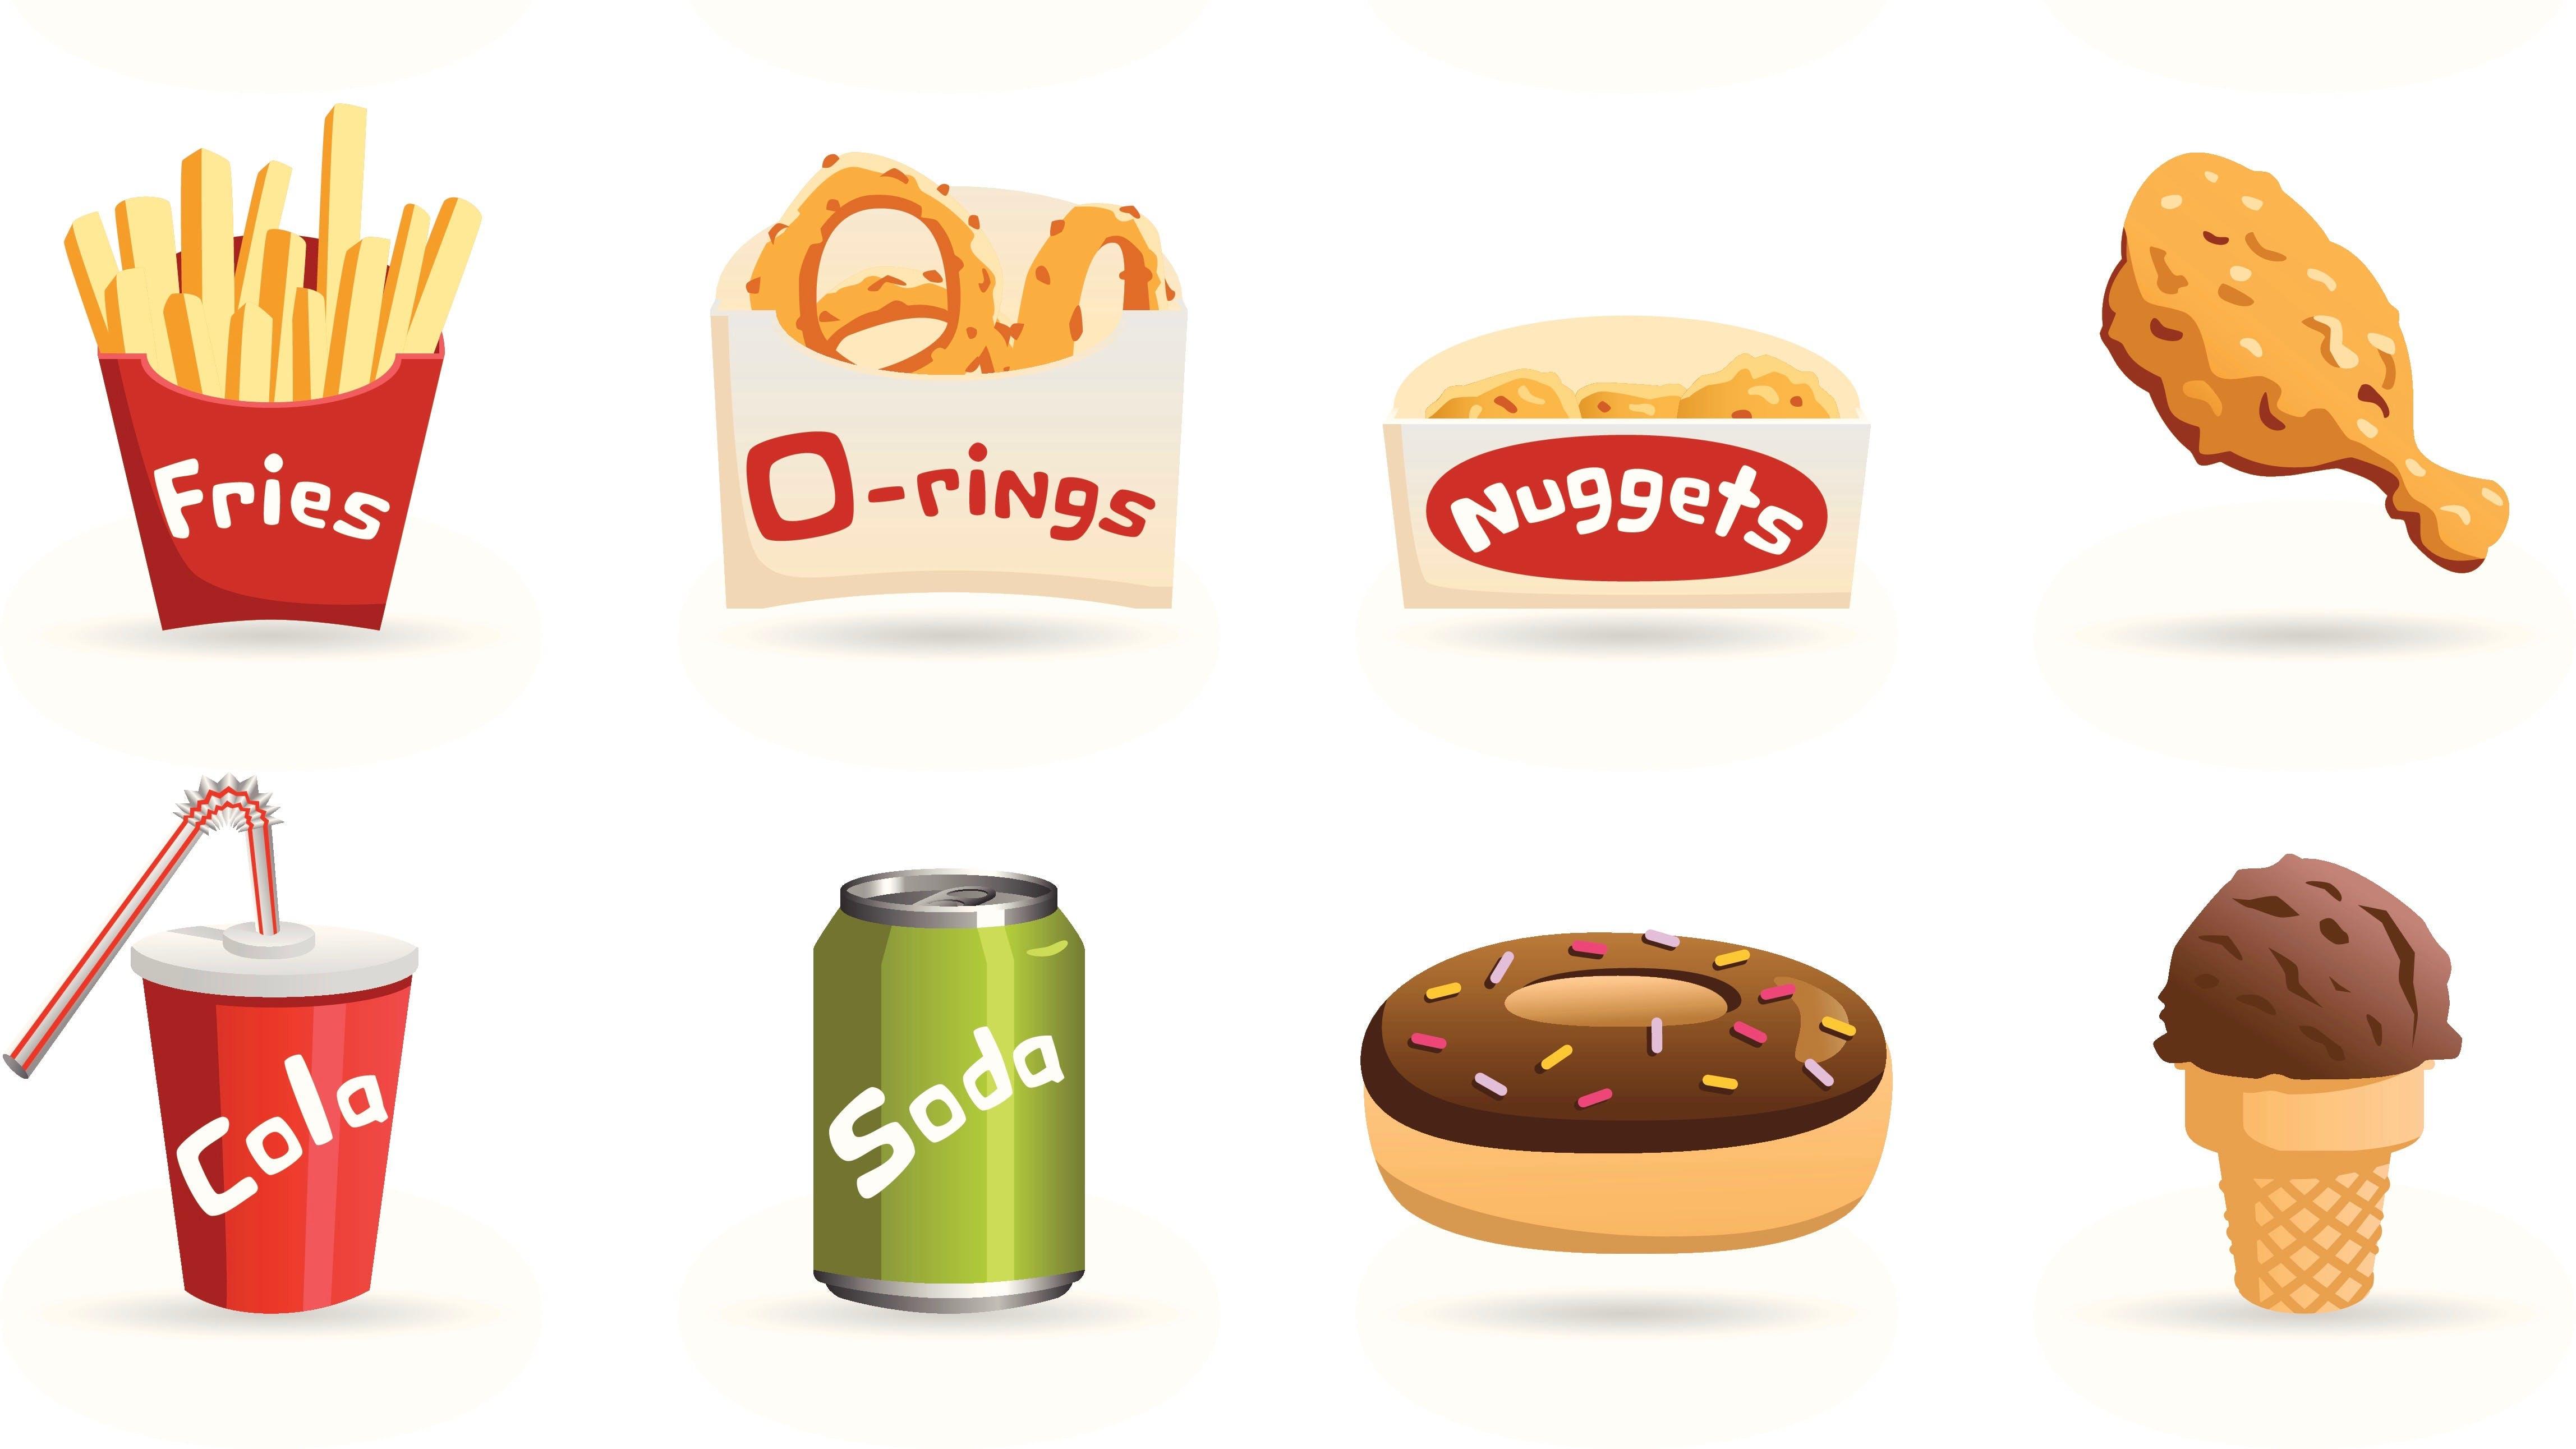 Iconos de comida chatarra